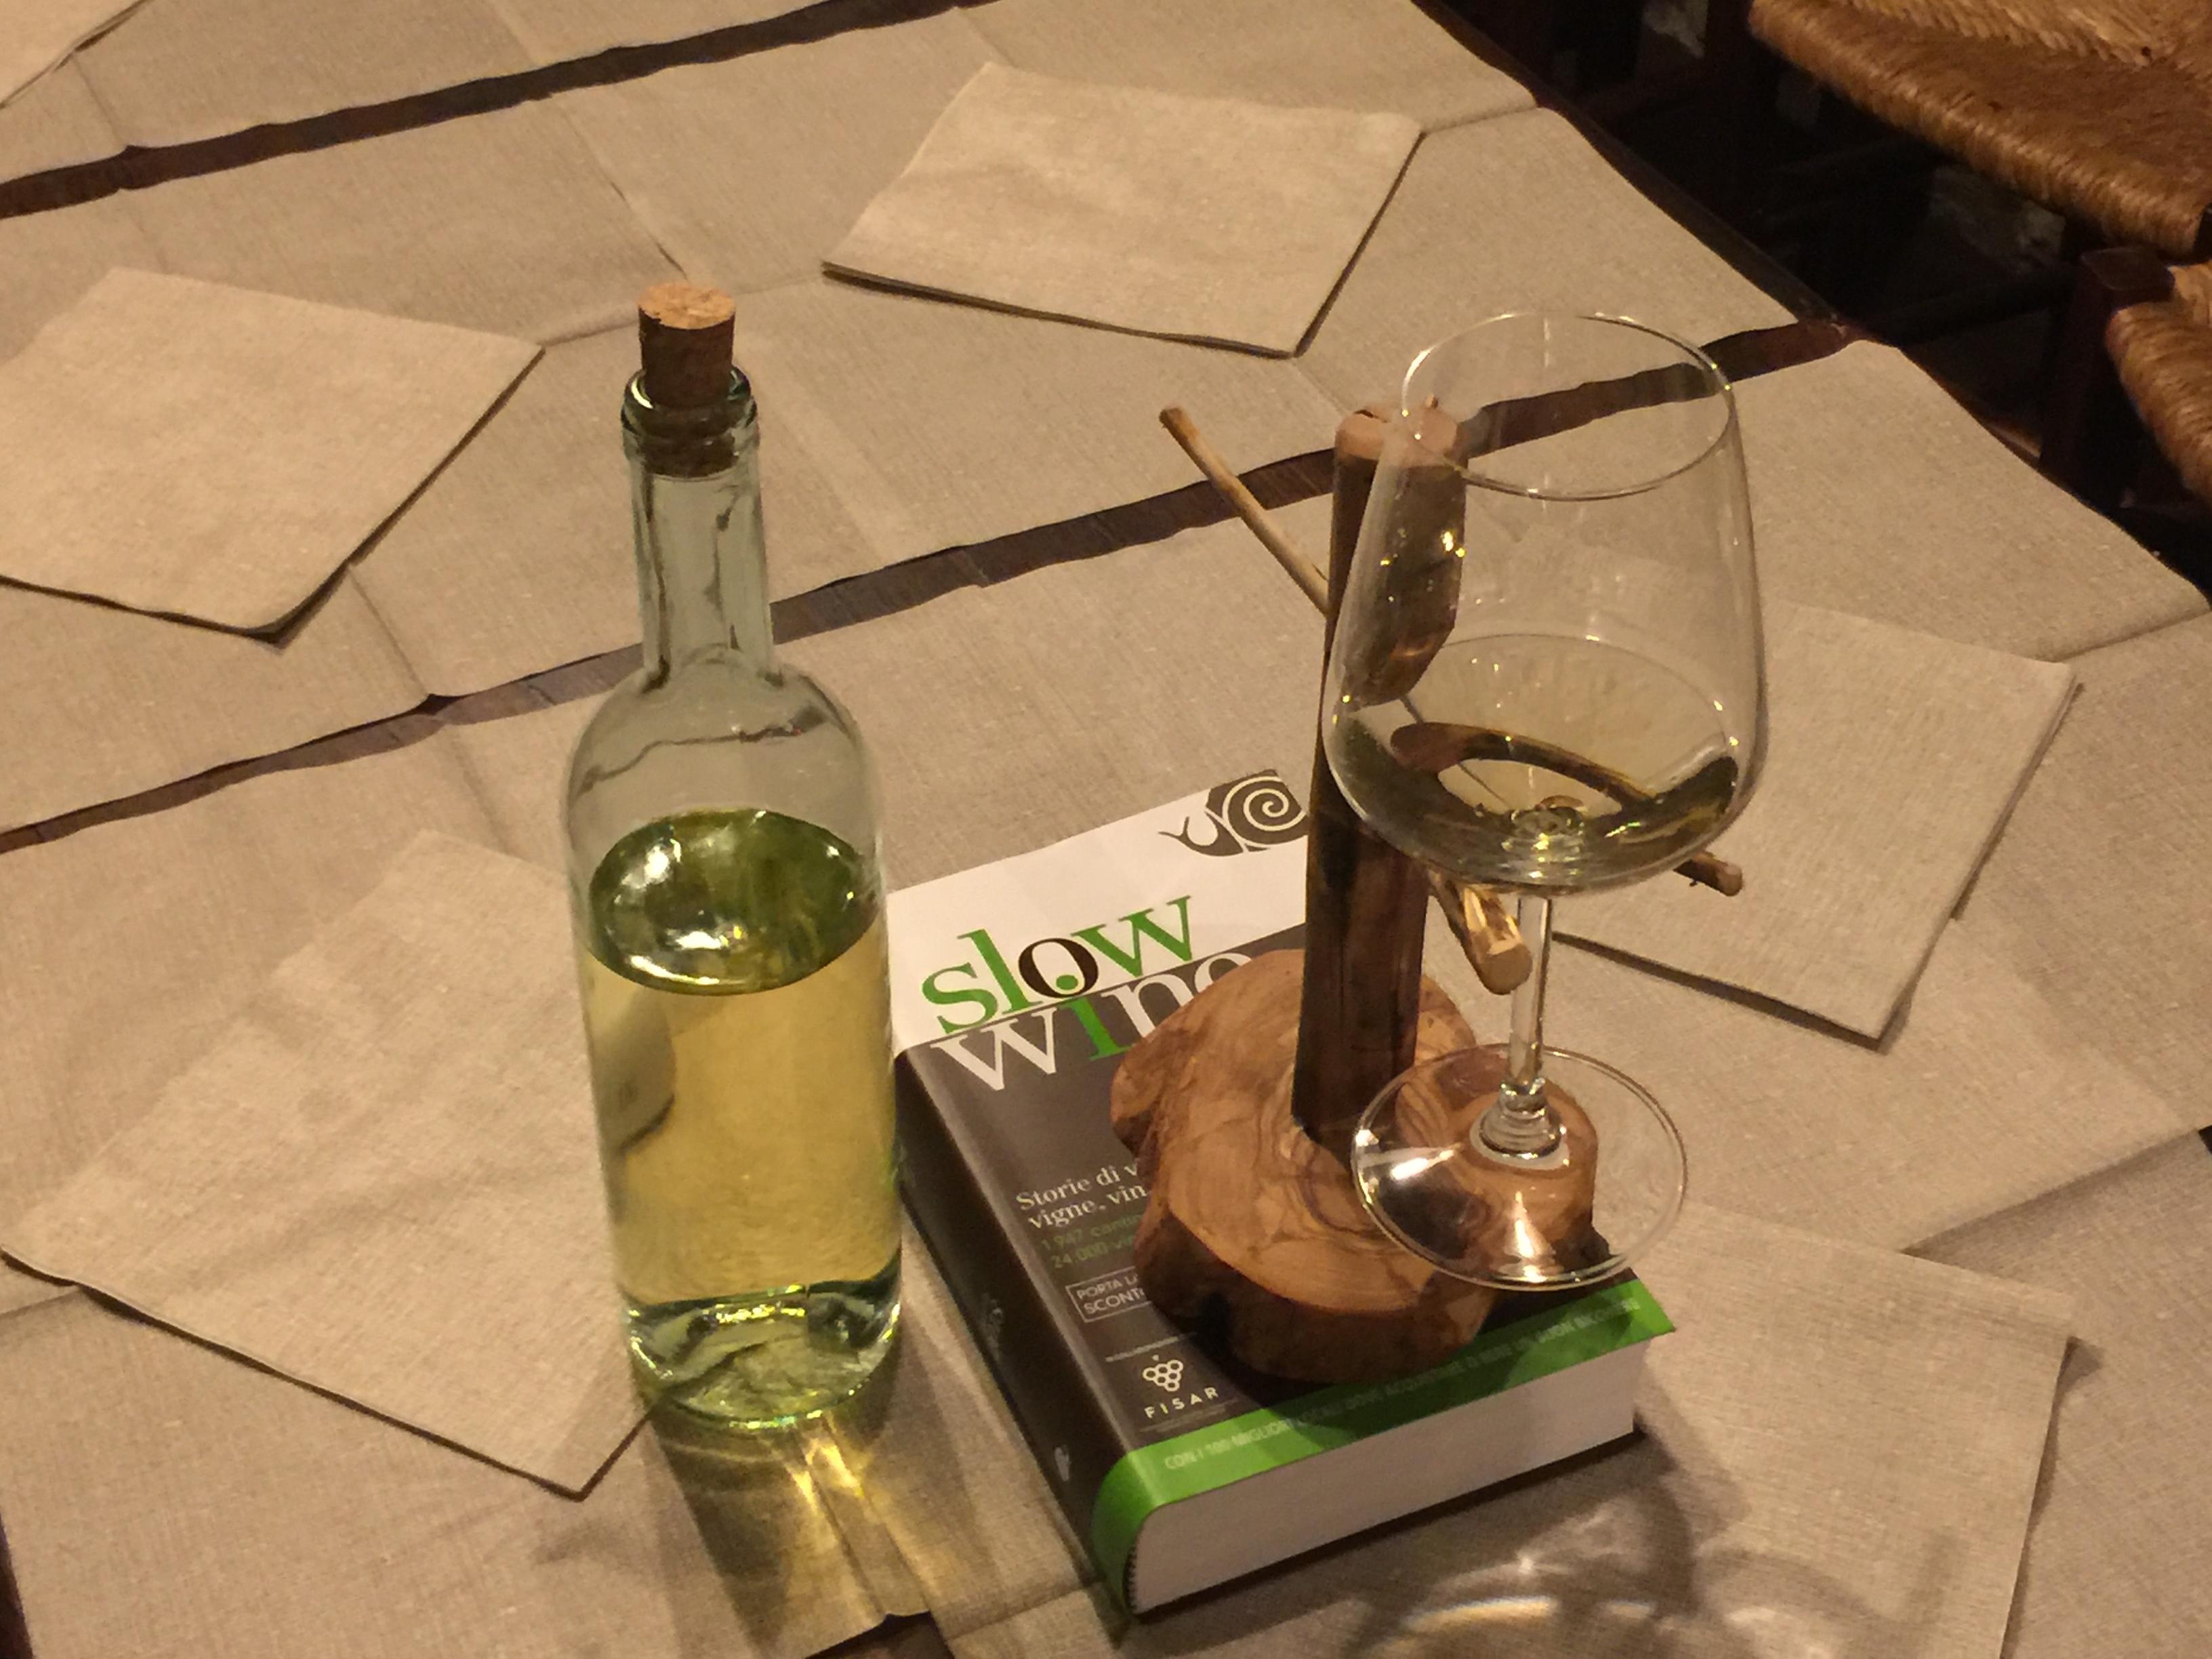 Nativo-ristorante-cantina-vino-bianco